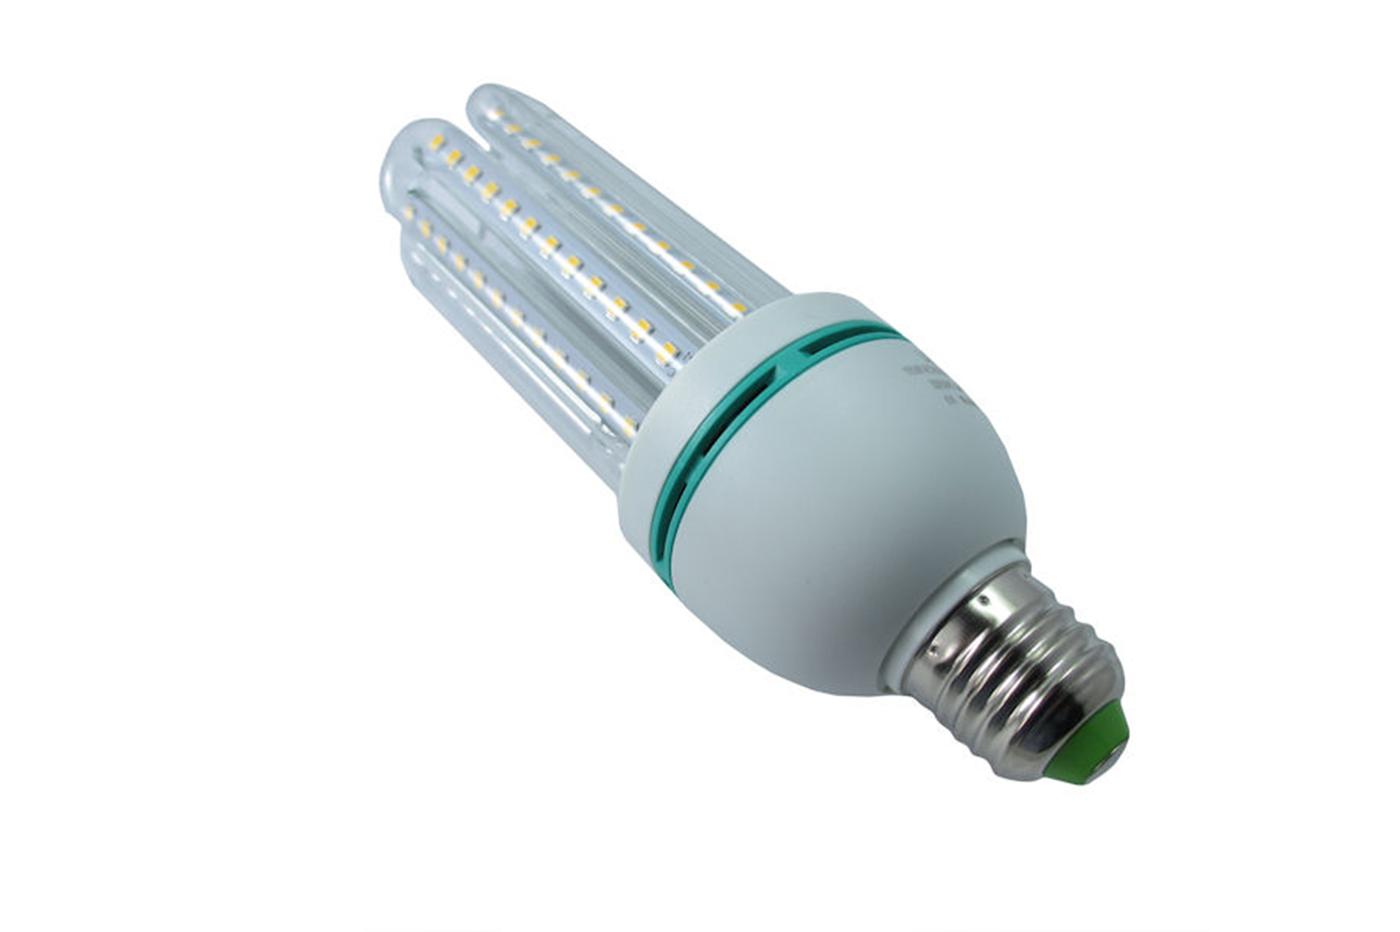 Lampadina led smd 3w 5w 7w 9w 12w 16w 20w 24w 40w 50w luce for Lampadina led 3w